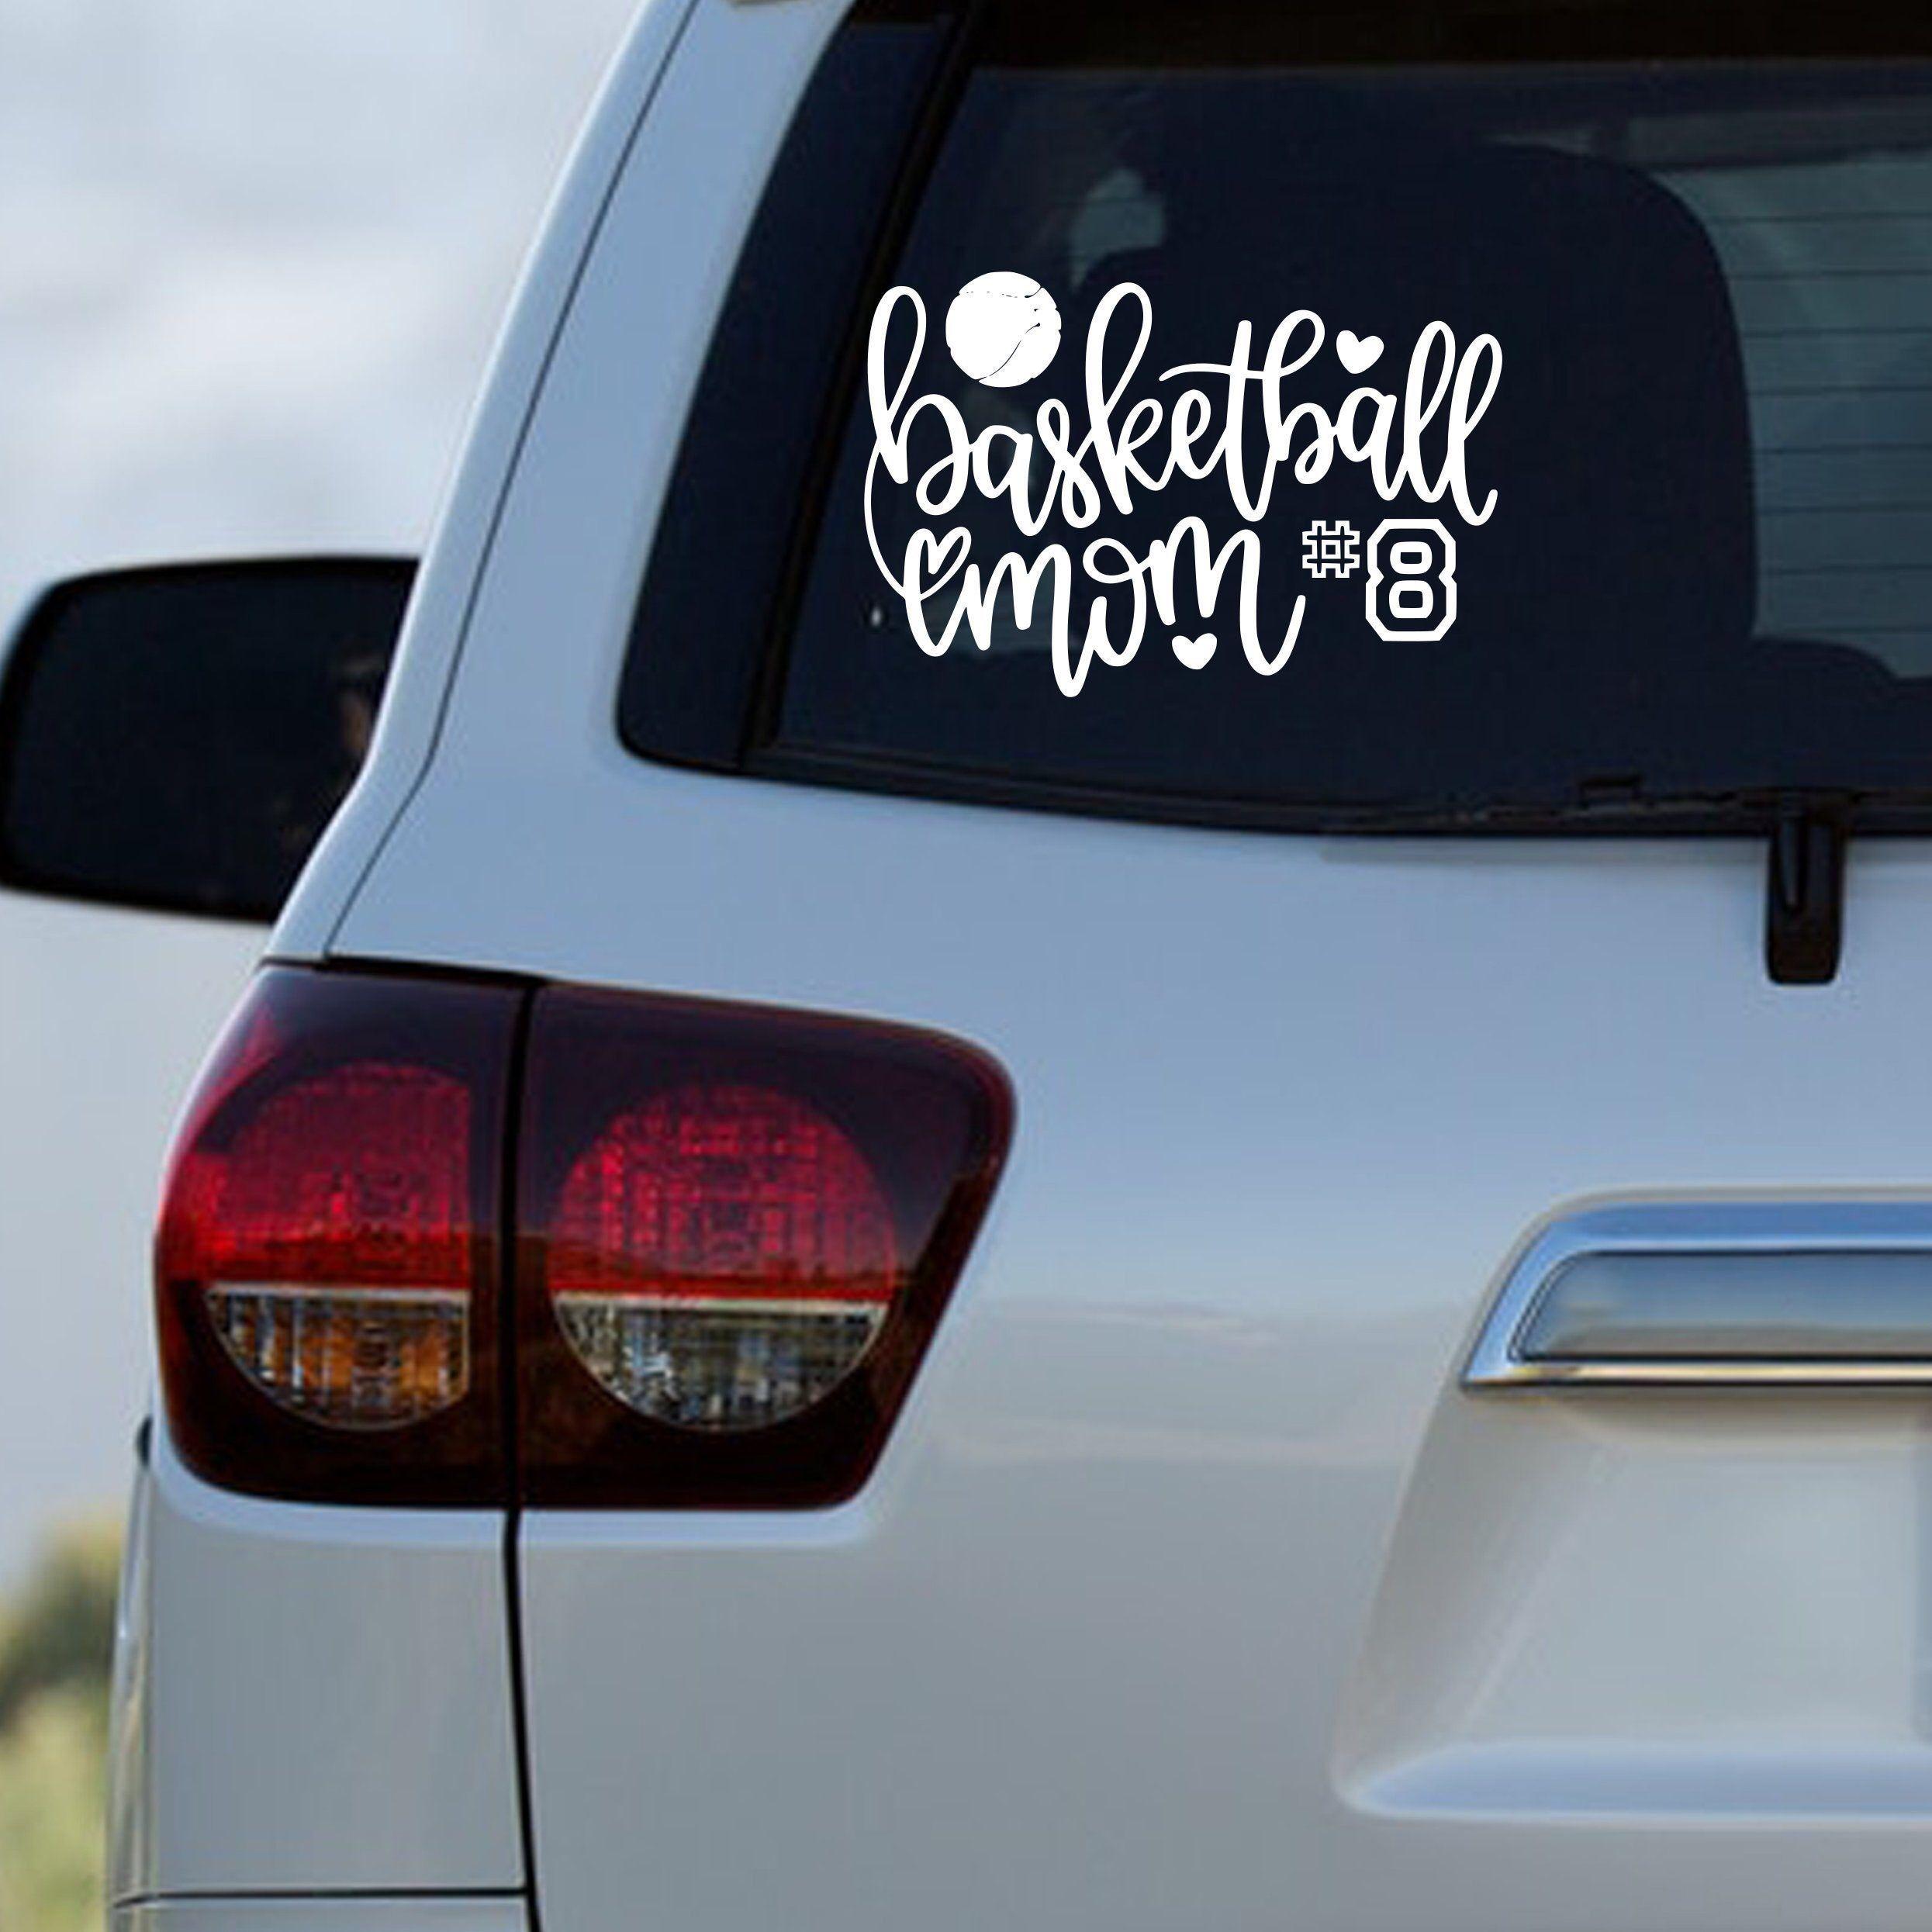 Basketball Mom Car Window Decal Etsy Cute Car Decals Car Monogram Decal Vinyl For Cars [ 2491 x 2491 Pixel ]